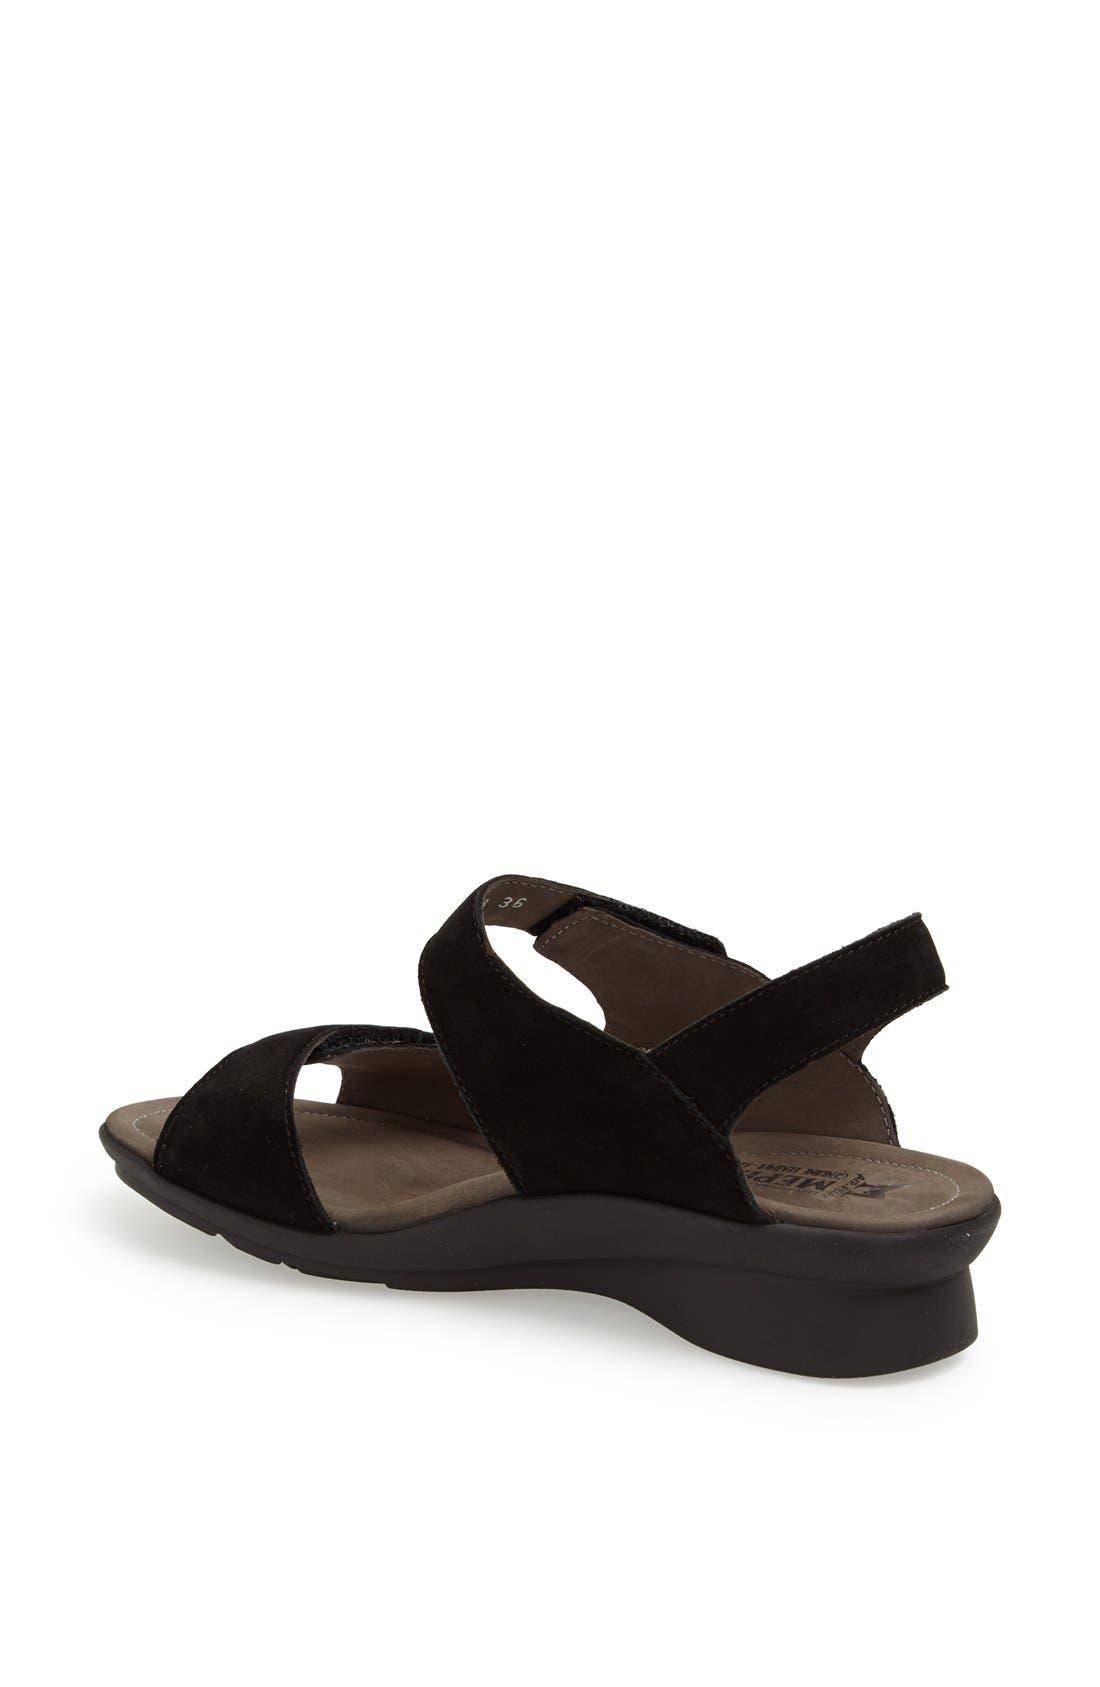 'Prudy' Leather Sandal,                             Alternate thumbnail 2, color,                             BLACK NUBUCK LEATHER